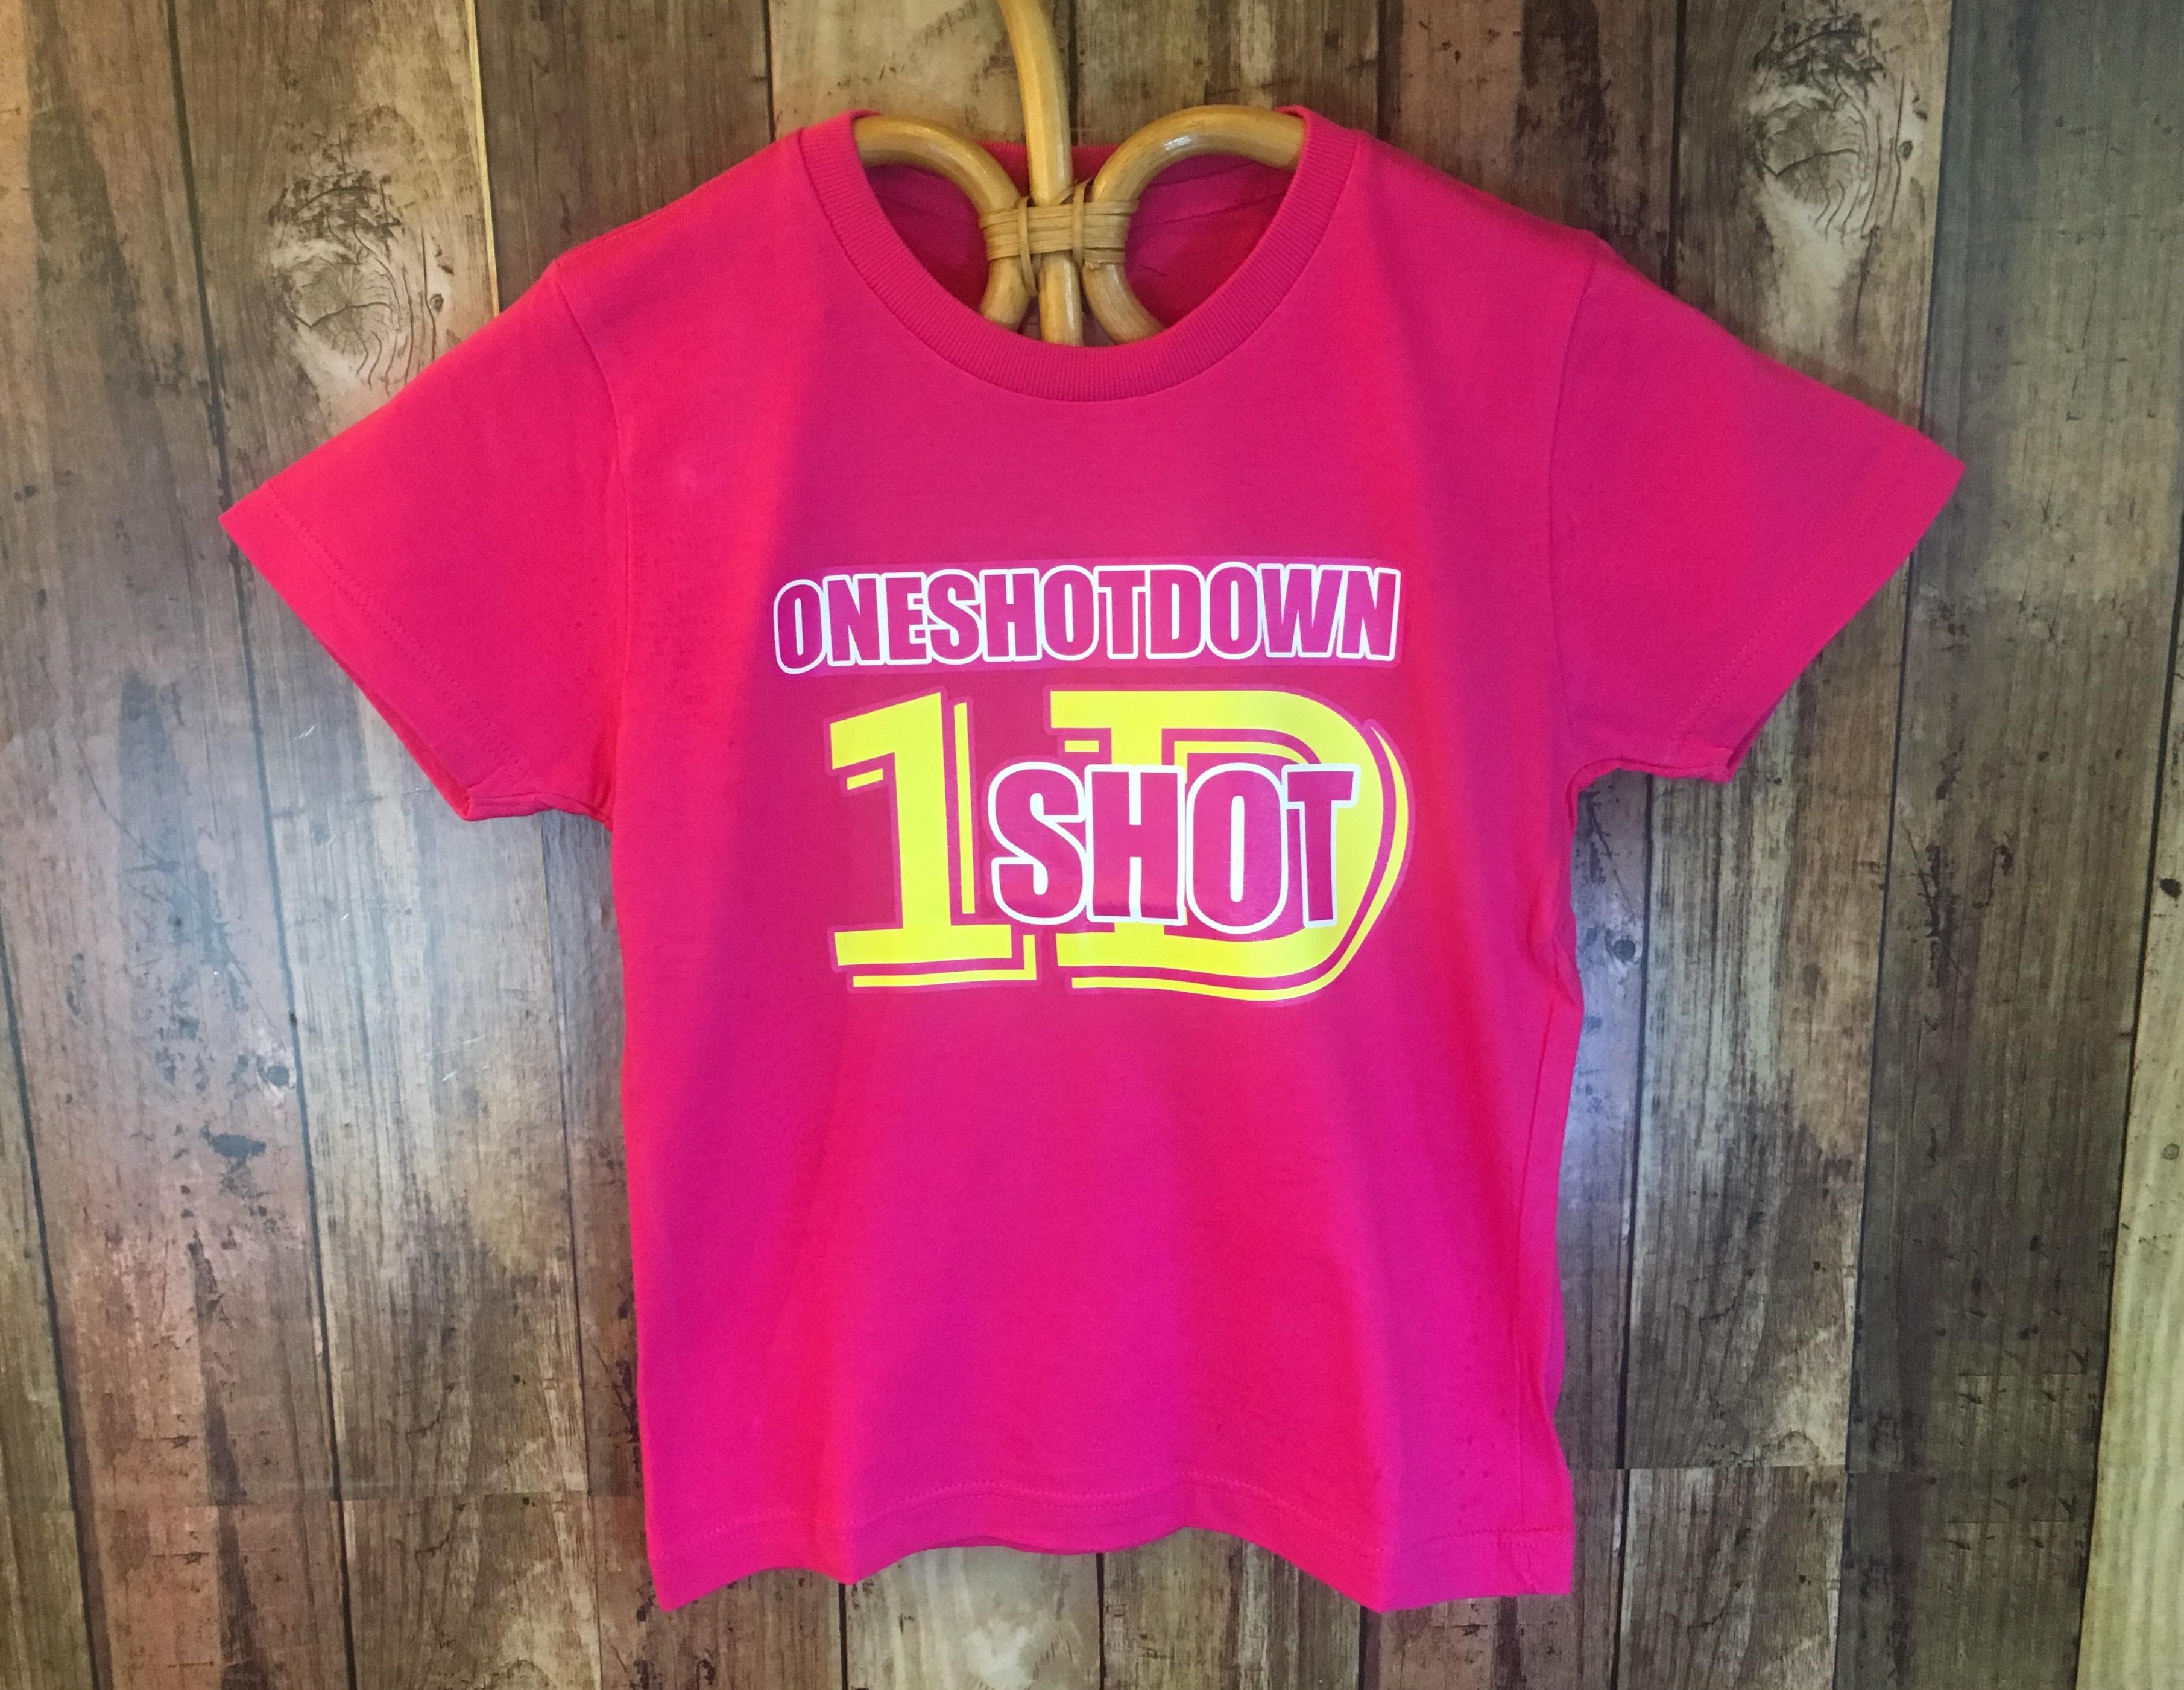 ONESHOTDOWN キッズ Tシャツ (ロゴ) - 画像1